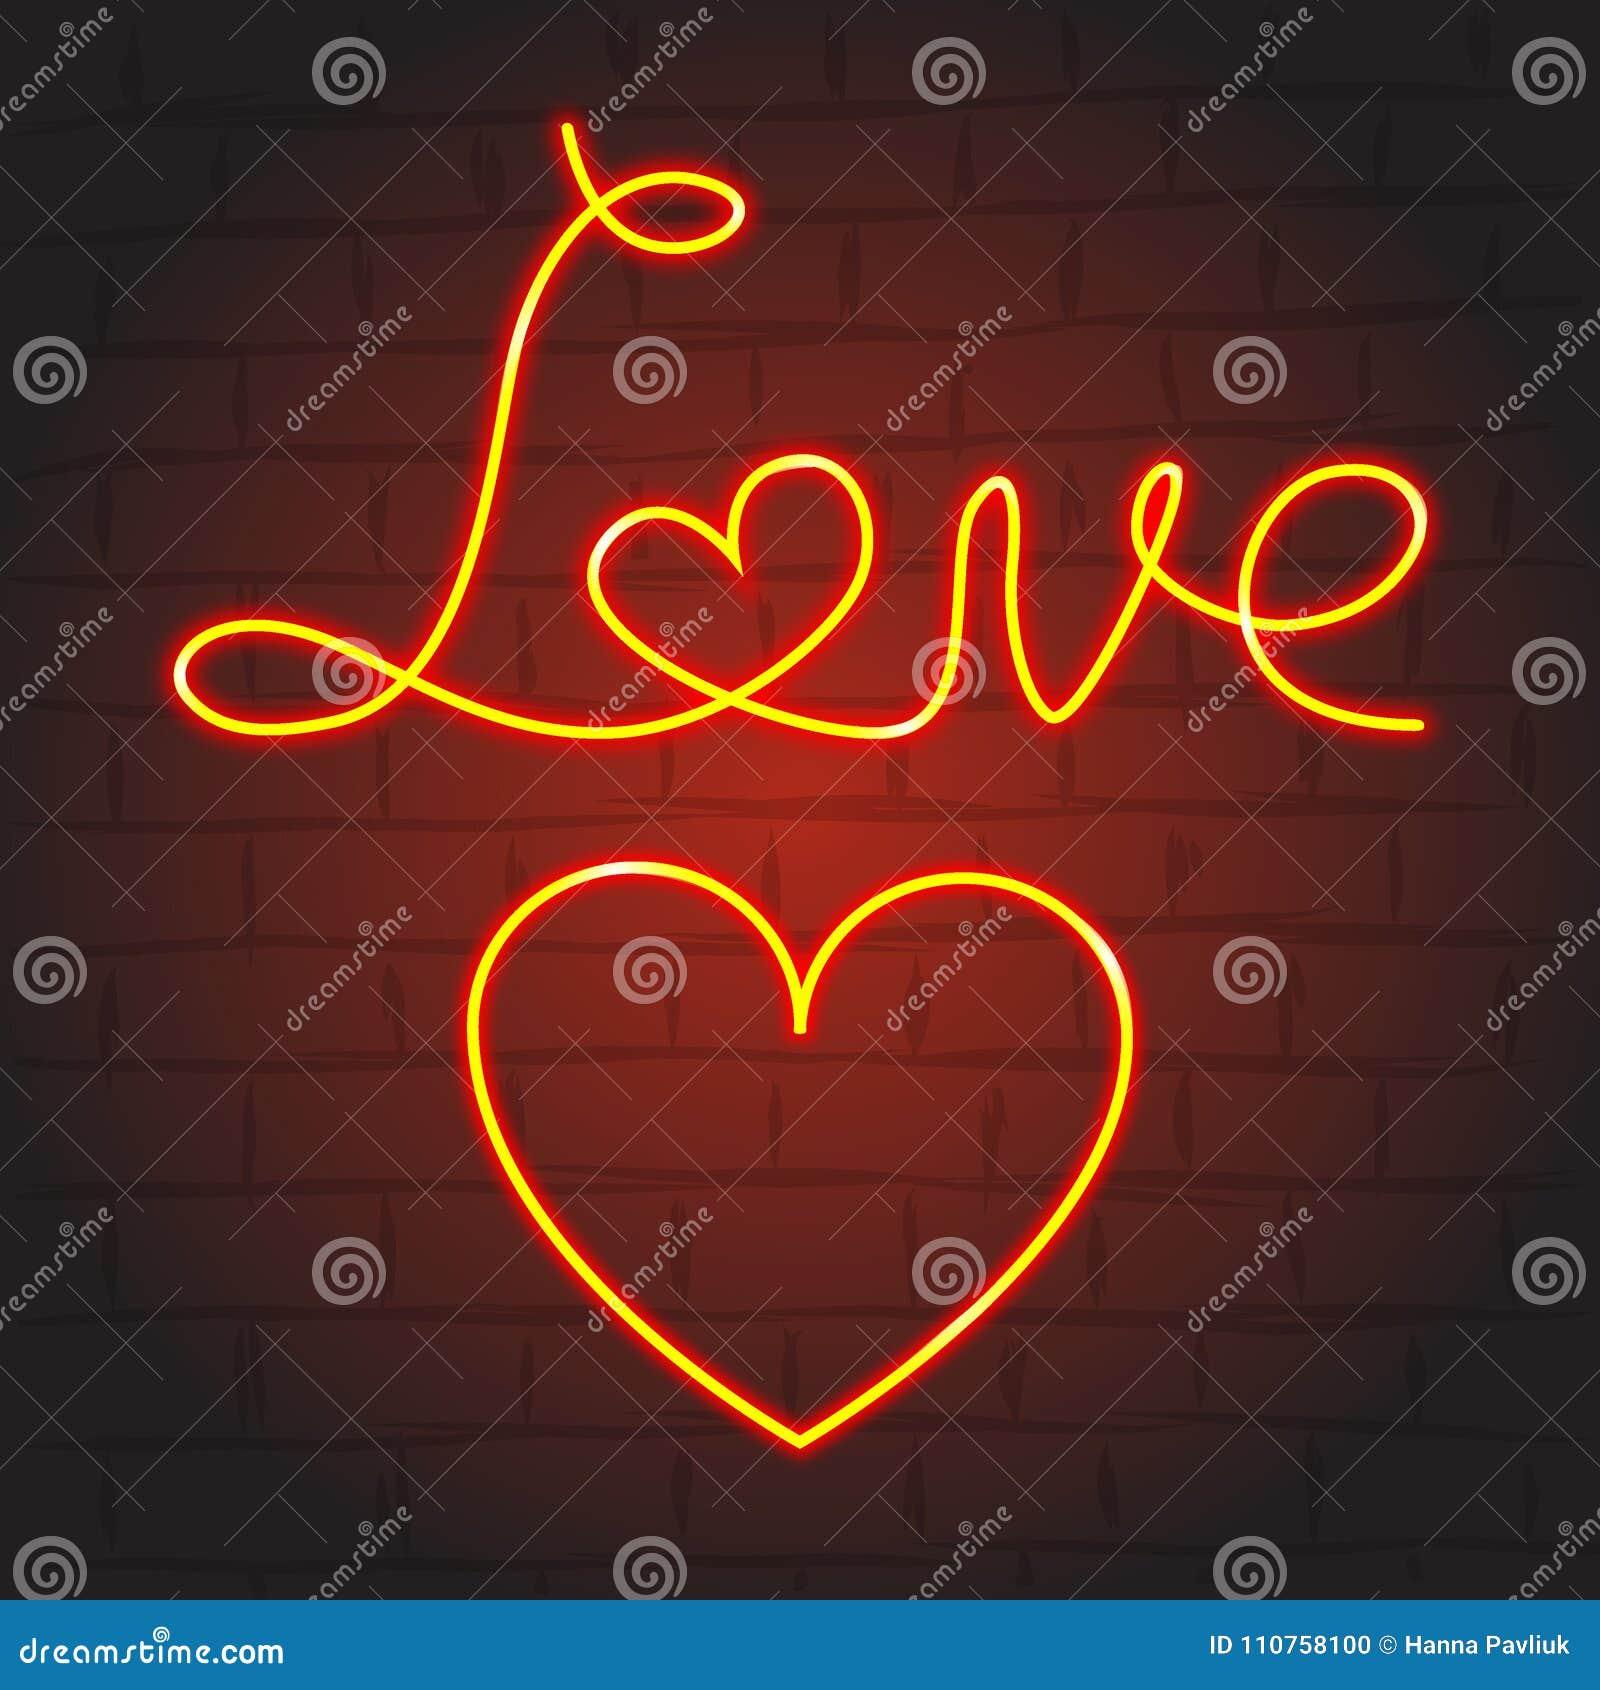 Love Symbols In Neon Glow On Dark Background Stock Vector